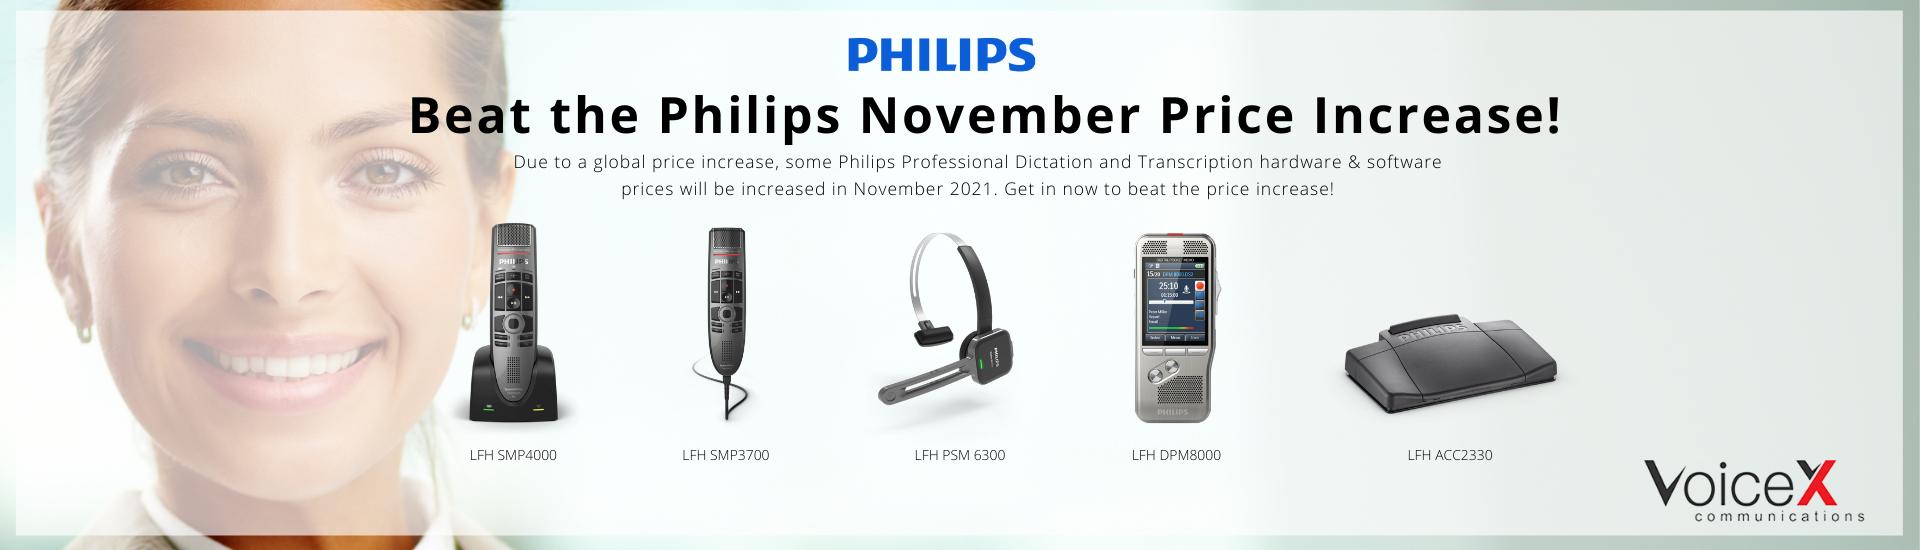 Beat the Philips November Price Increase!